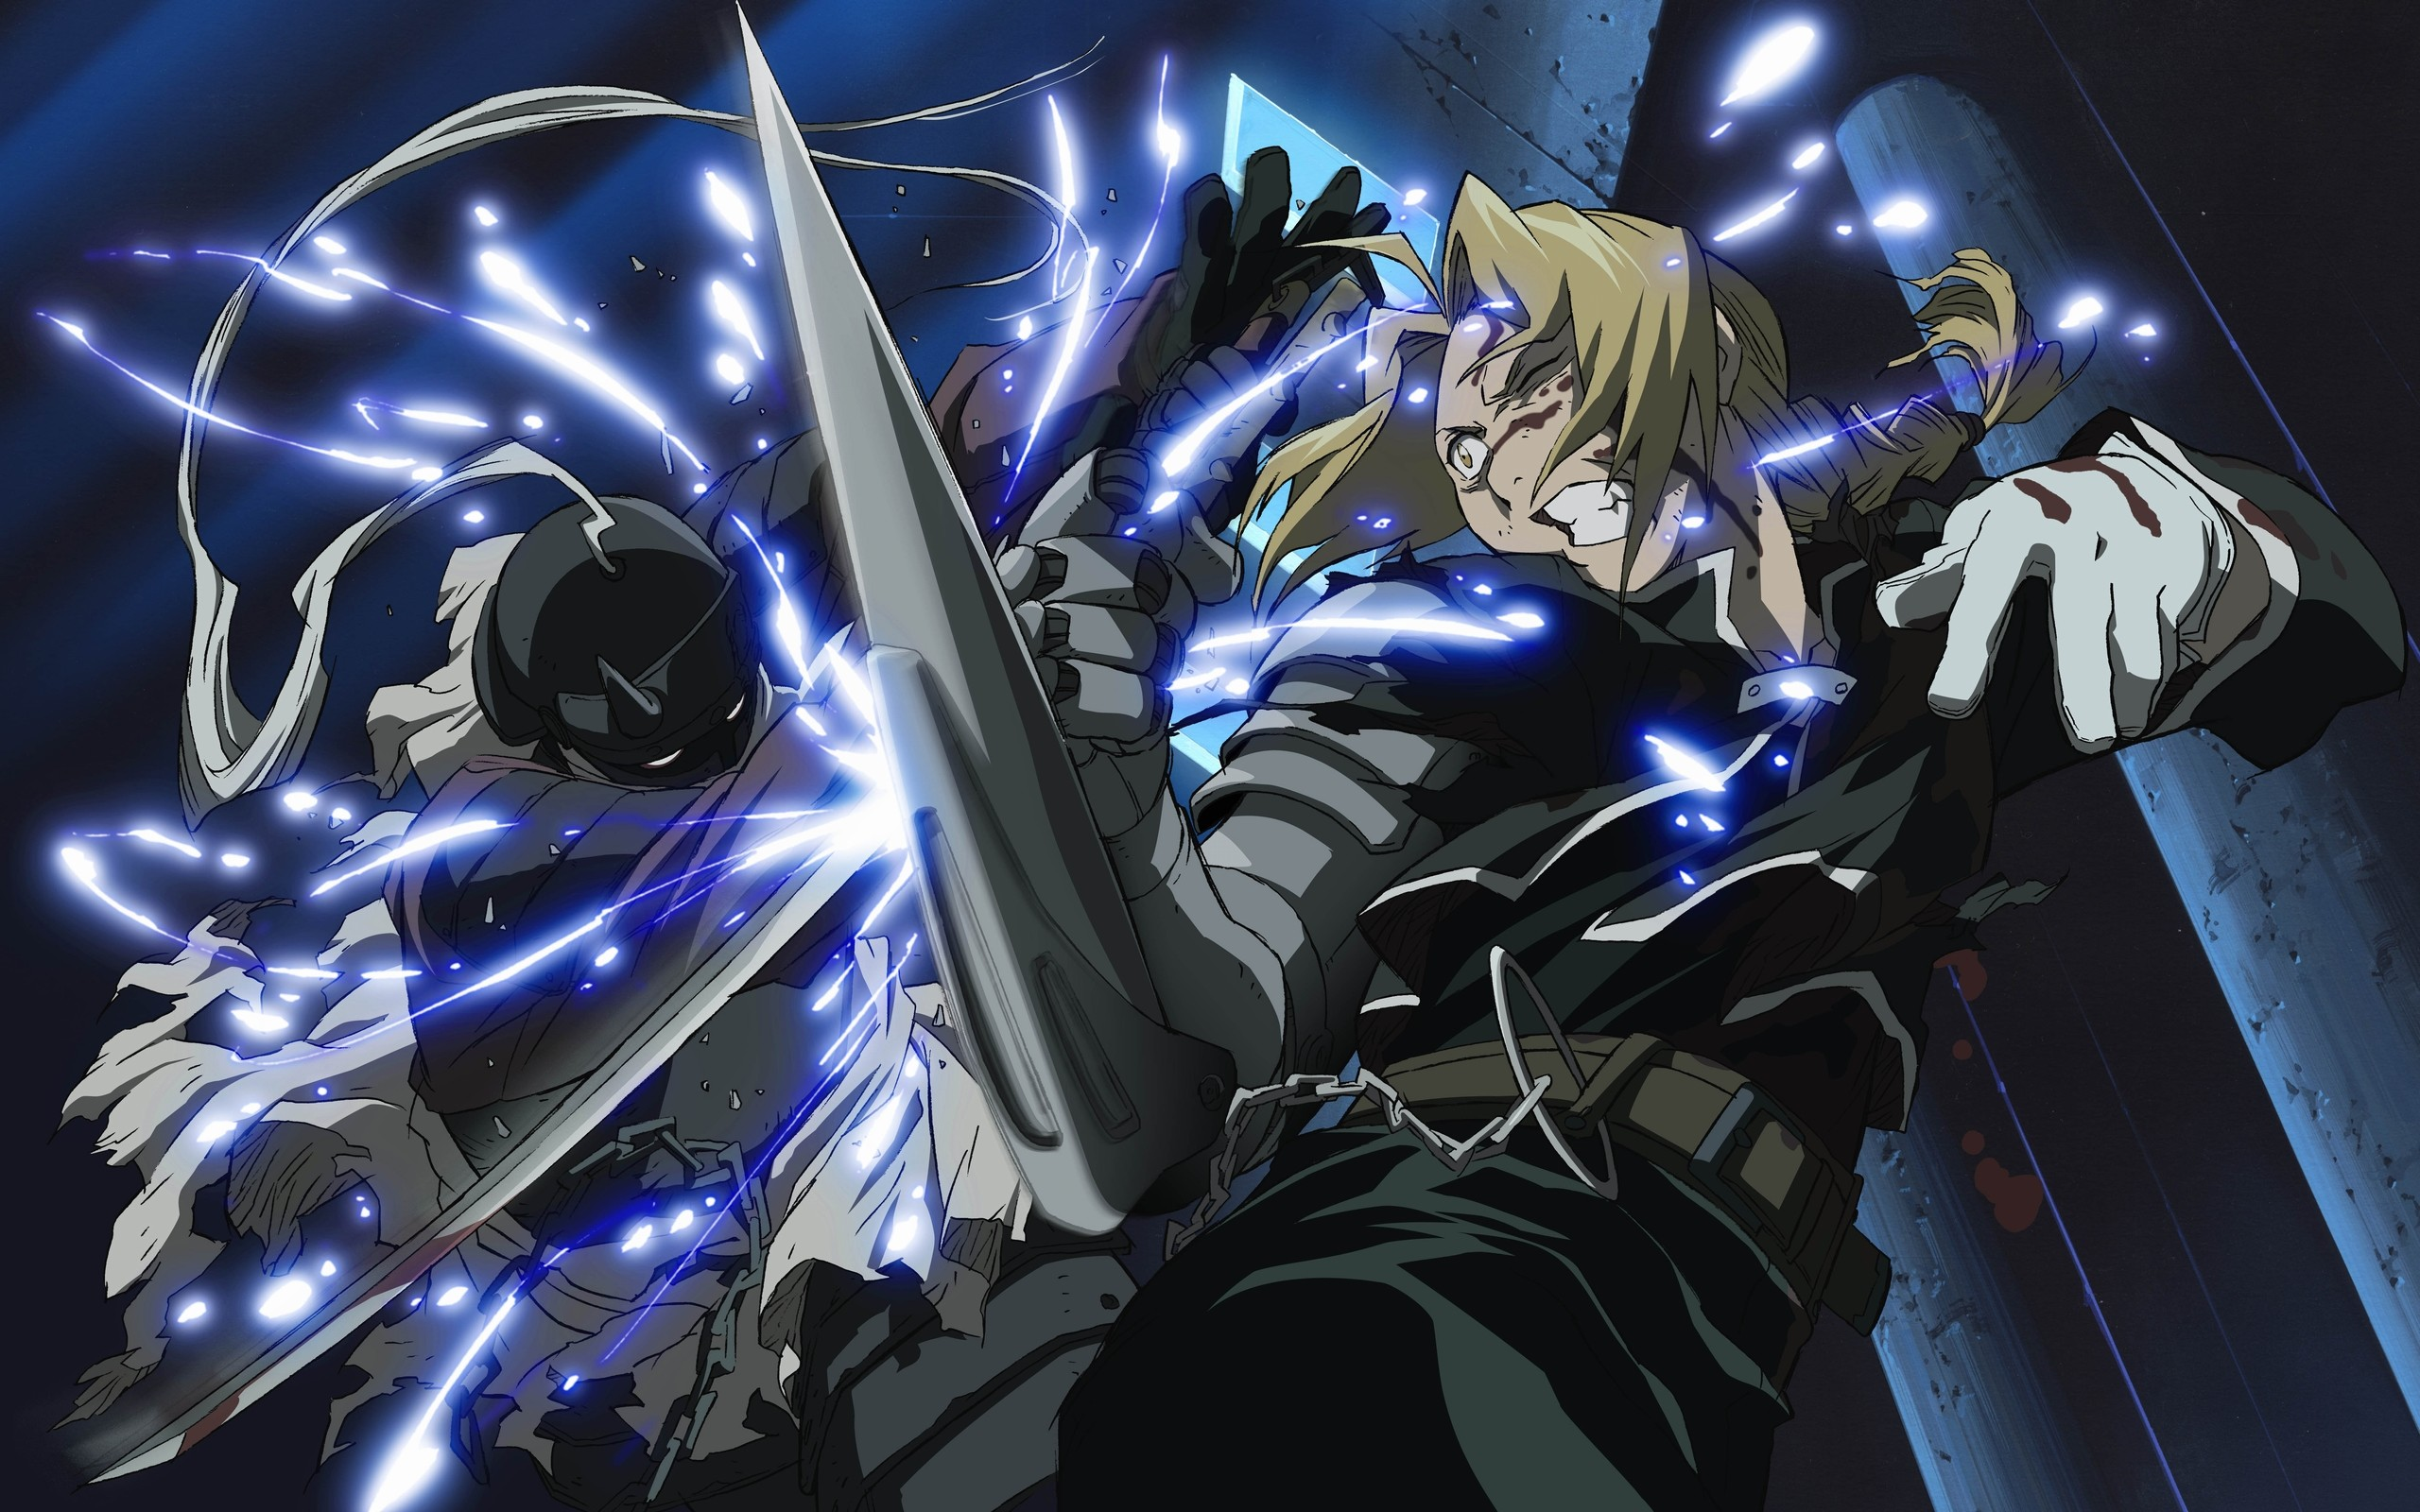 Fullmetal Alchemist · download Fullmetal Alchemist image